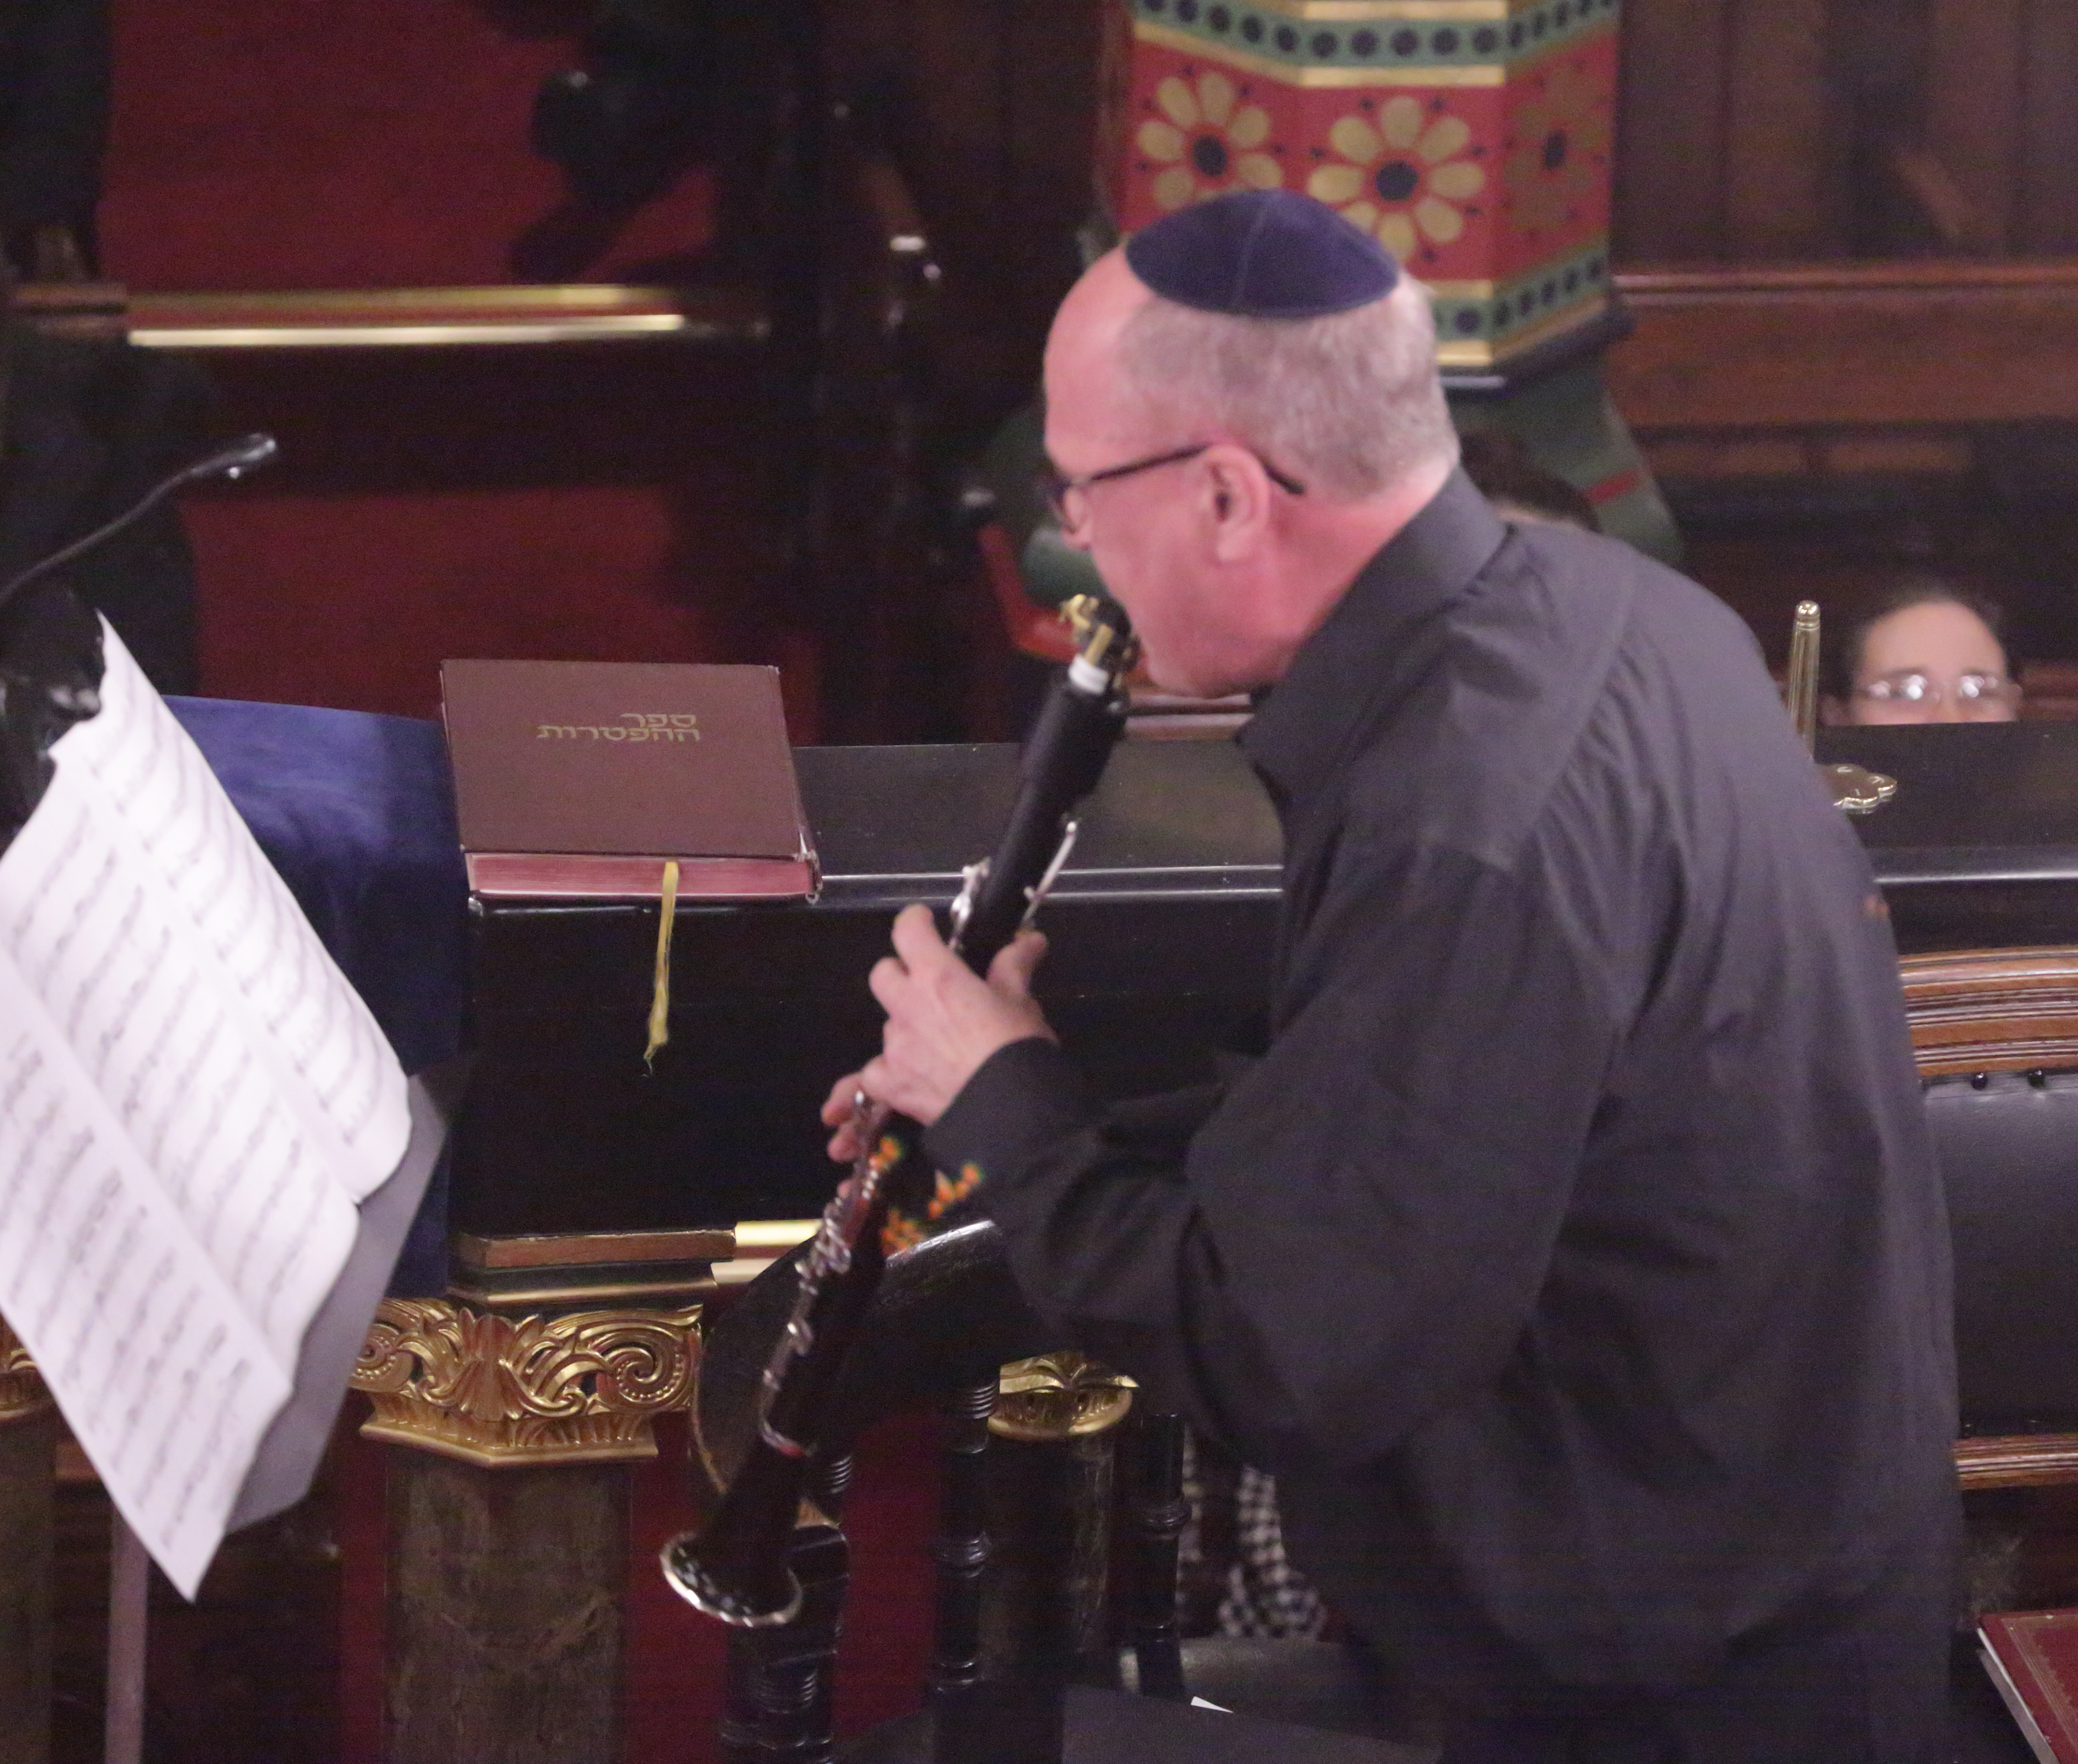 Liverpool Mozart Orchestra 18.11.17 Princes Rd Synagogue  andrew Robertrs 2Q1A7398